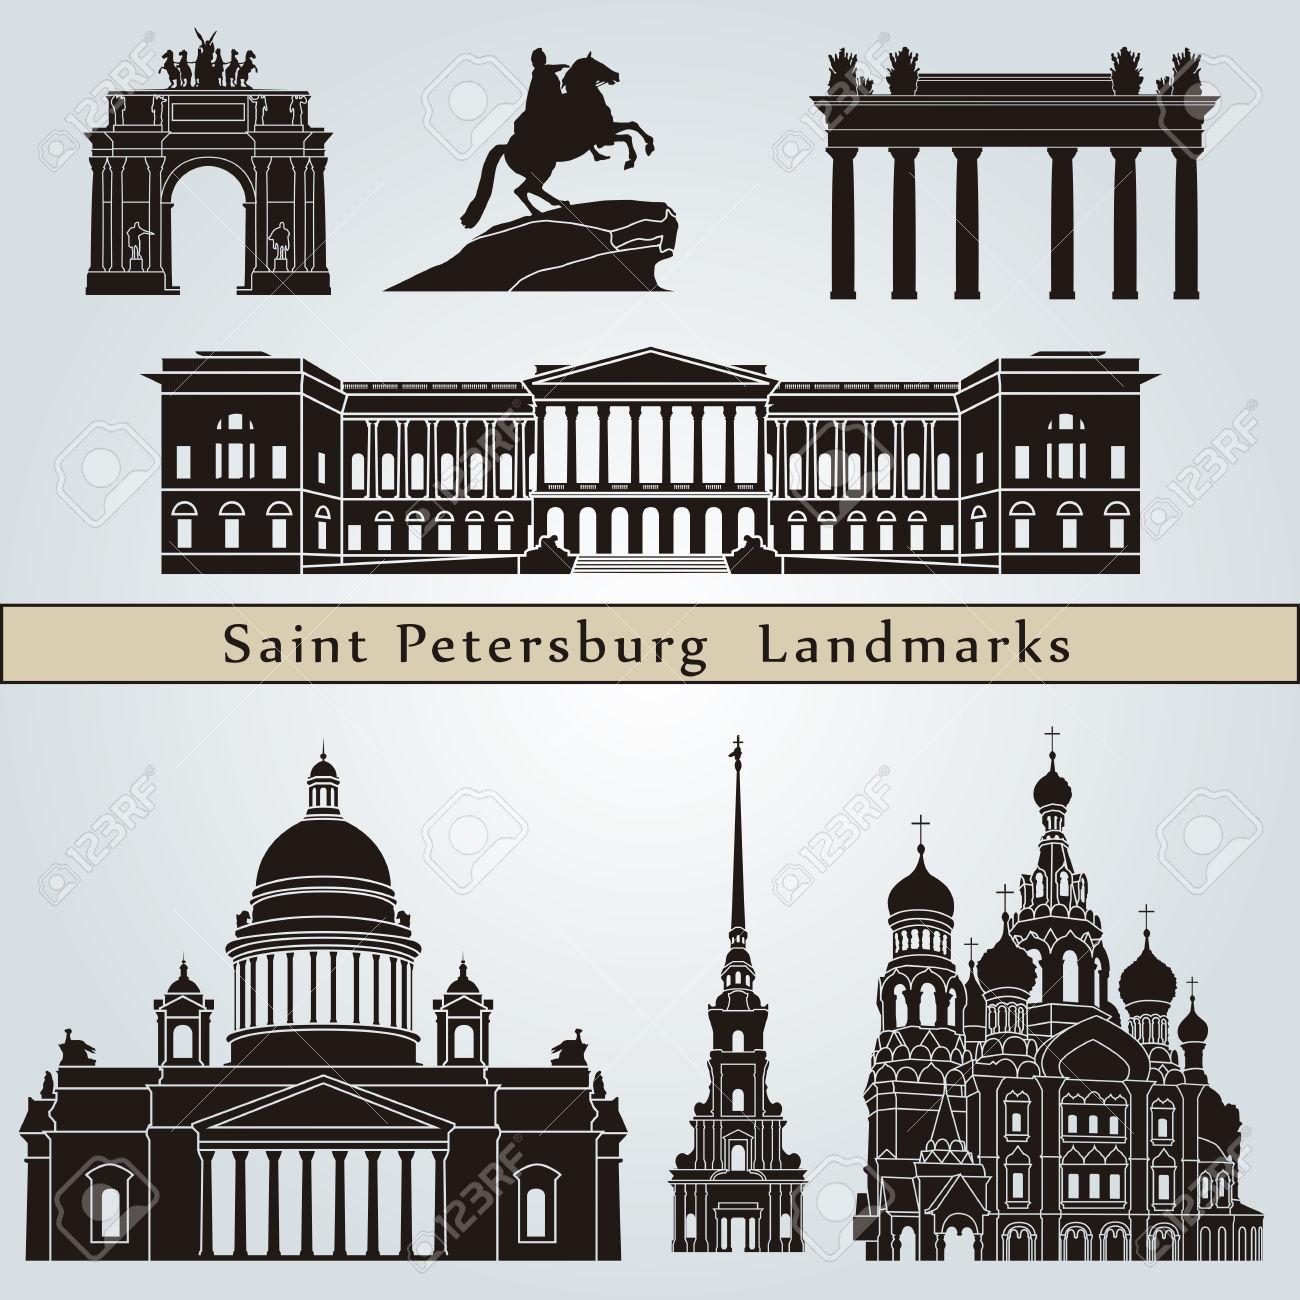 790 Saint Petersburg Cliparts, Stock Vector And Royalty Free Saint.